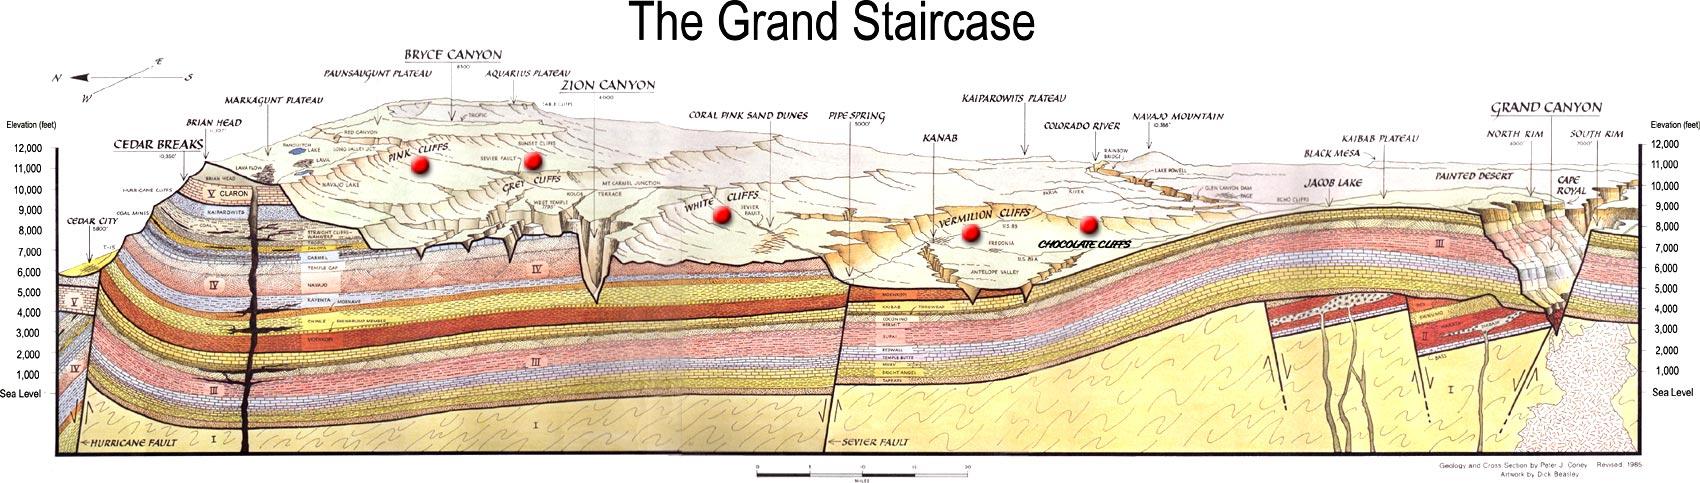 Geologic History Of The Colorado Plateau  UtahGeologycom - Map of colorado plateau region